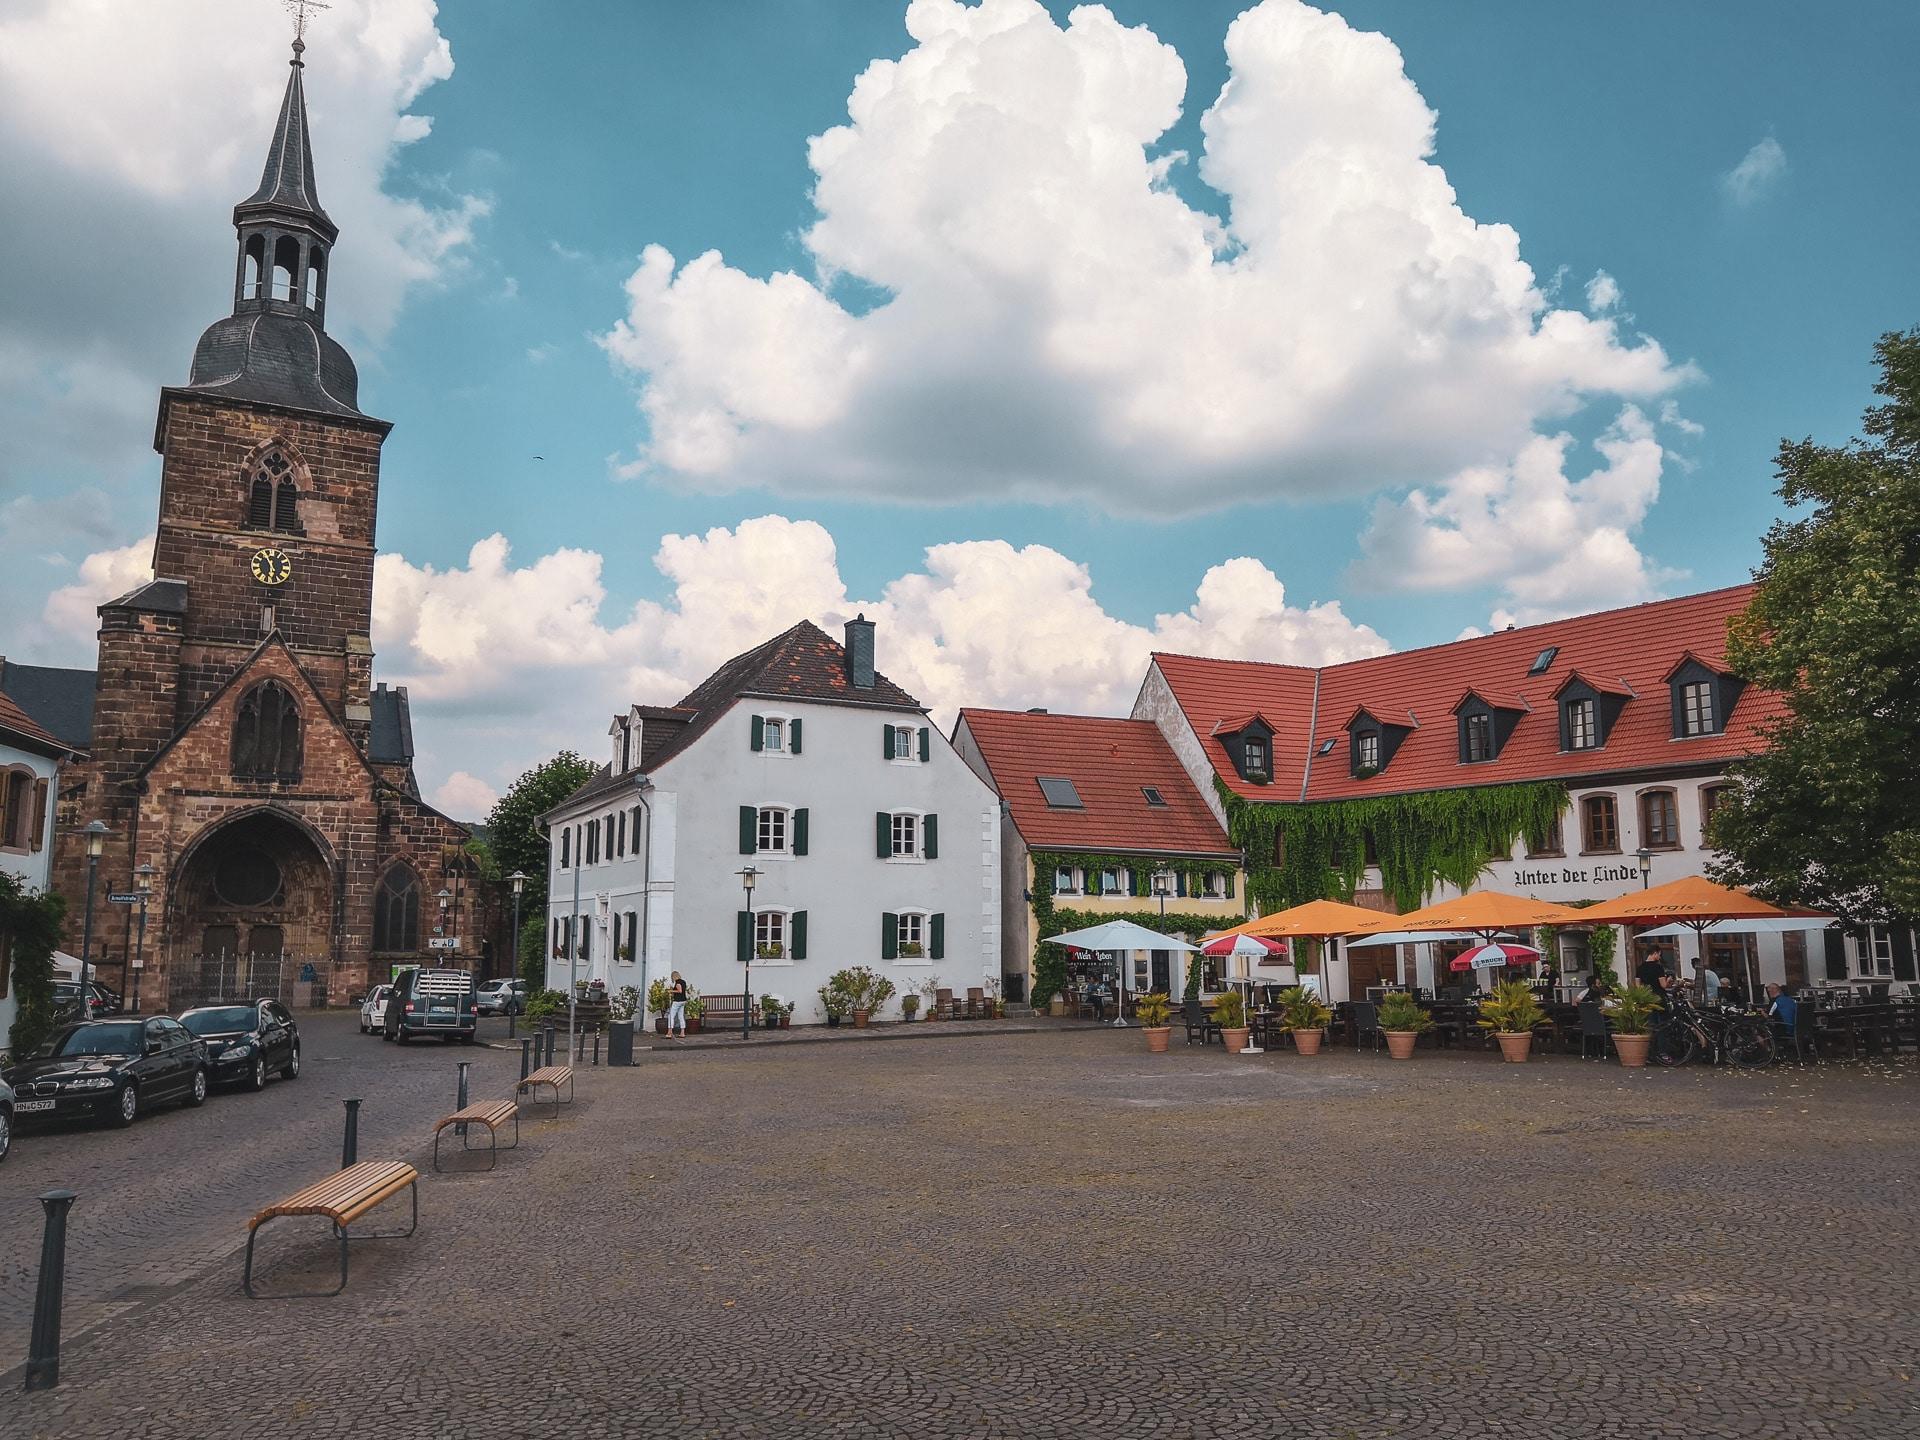 Marktplatz Sankt Arnual